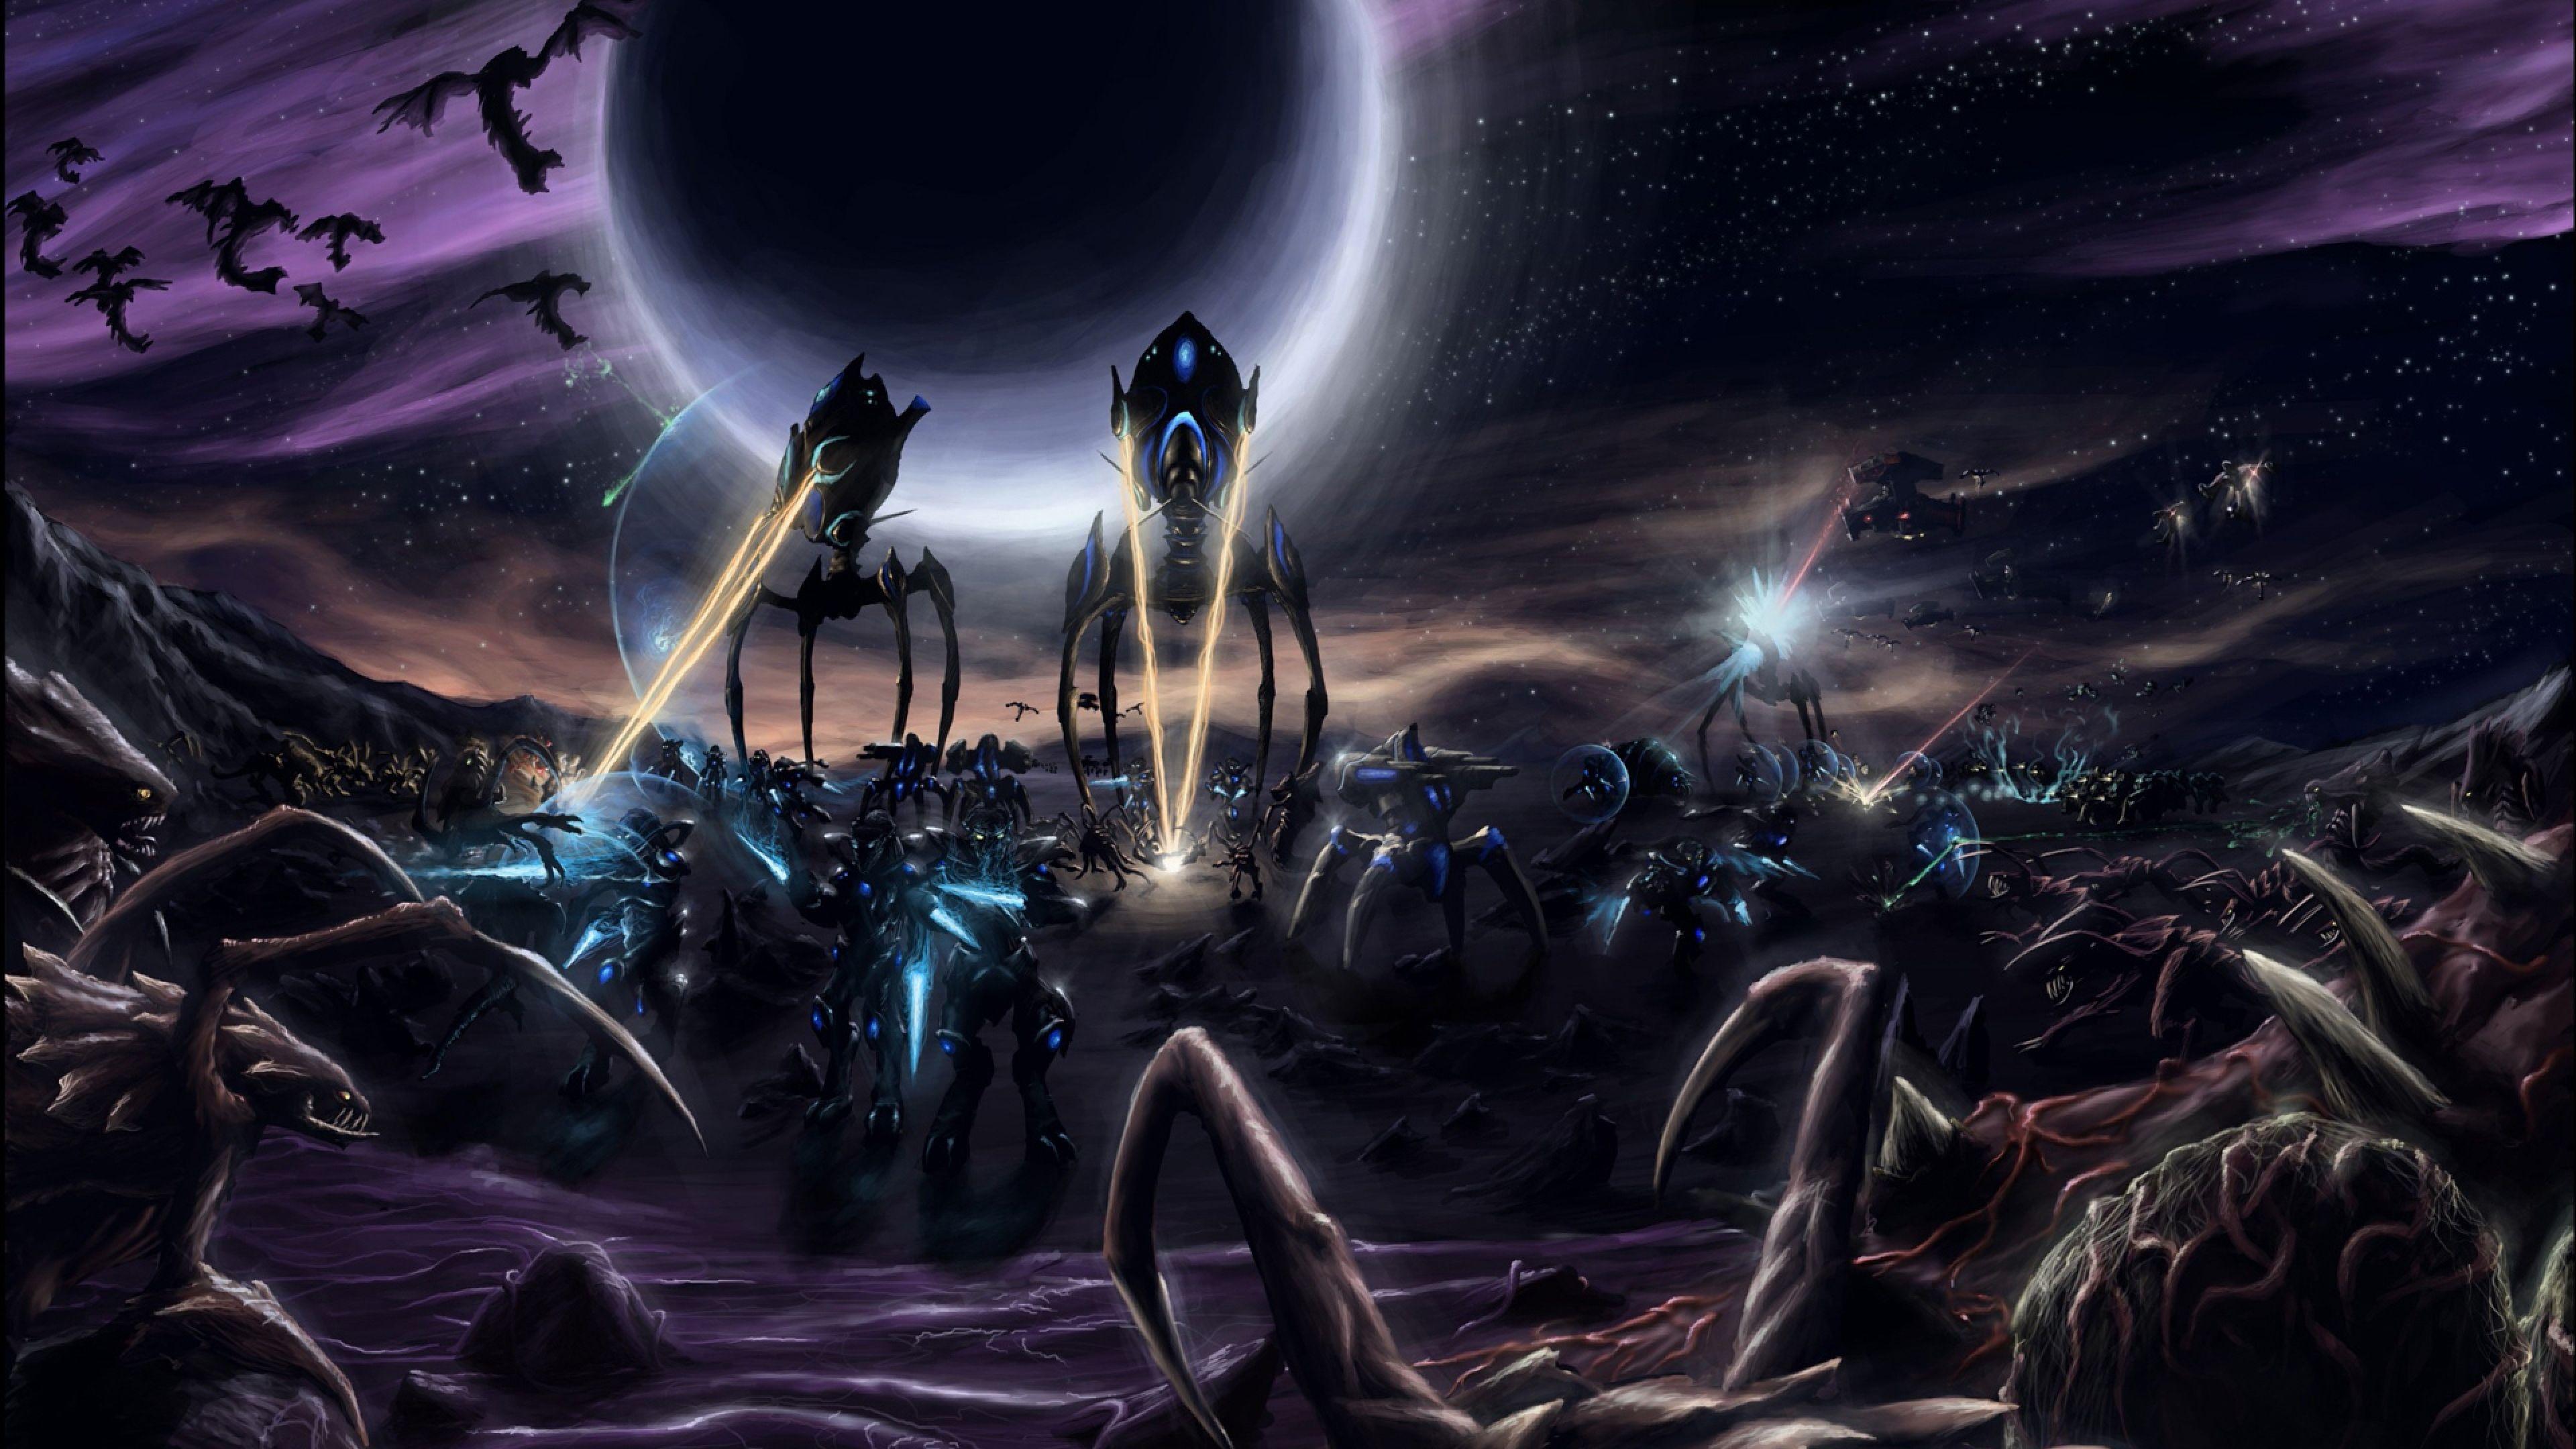 4K Starcraft Wallpapers   Top 4K Starcraft Backgrounds 3840x2160